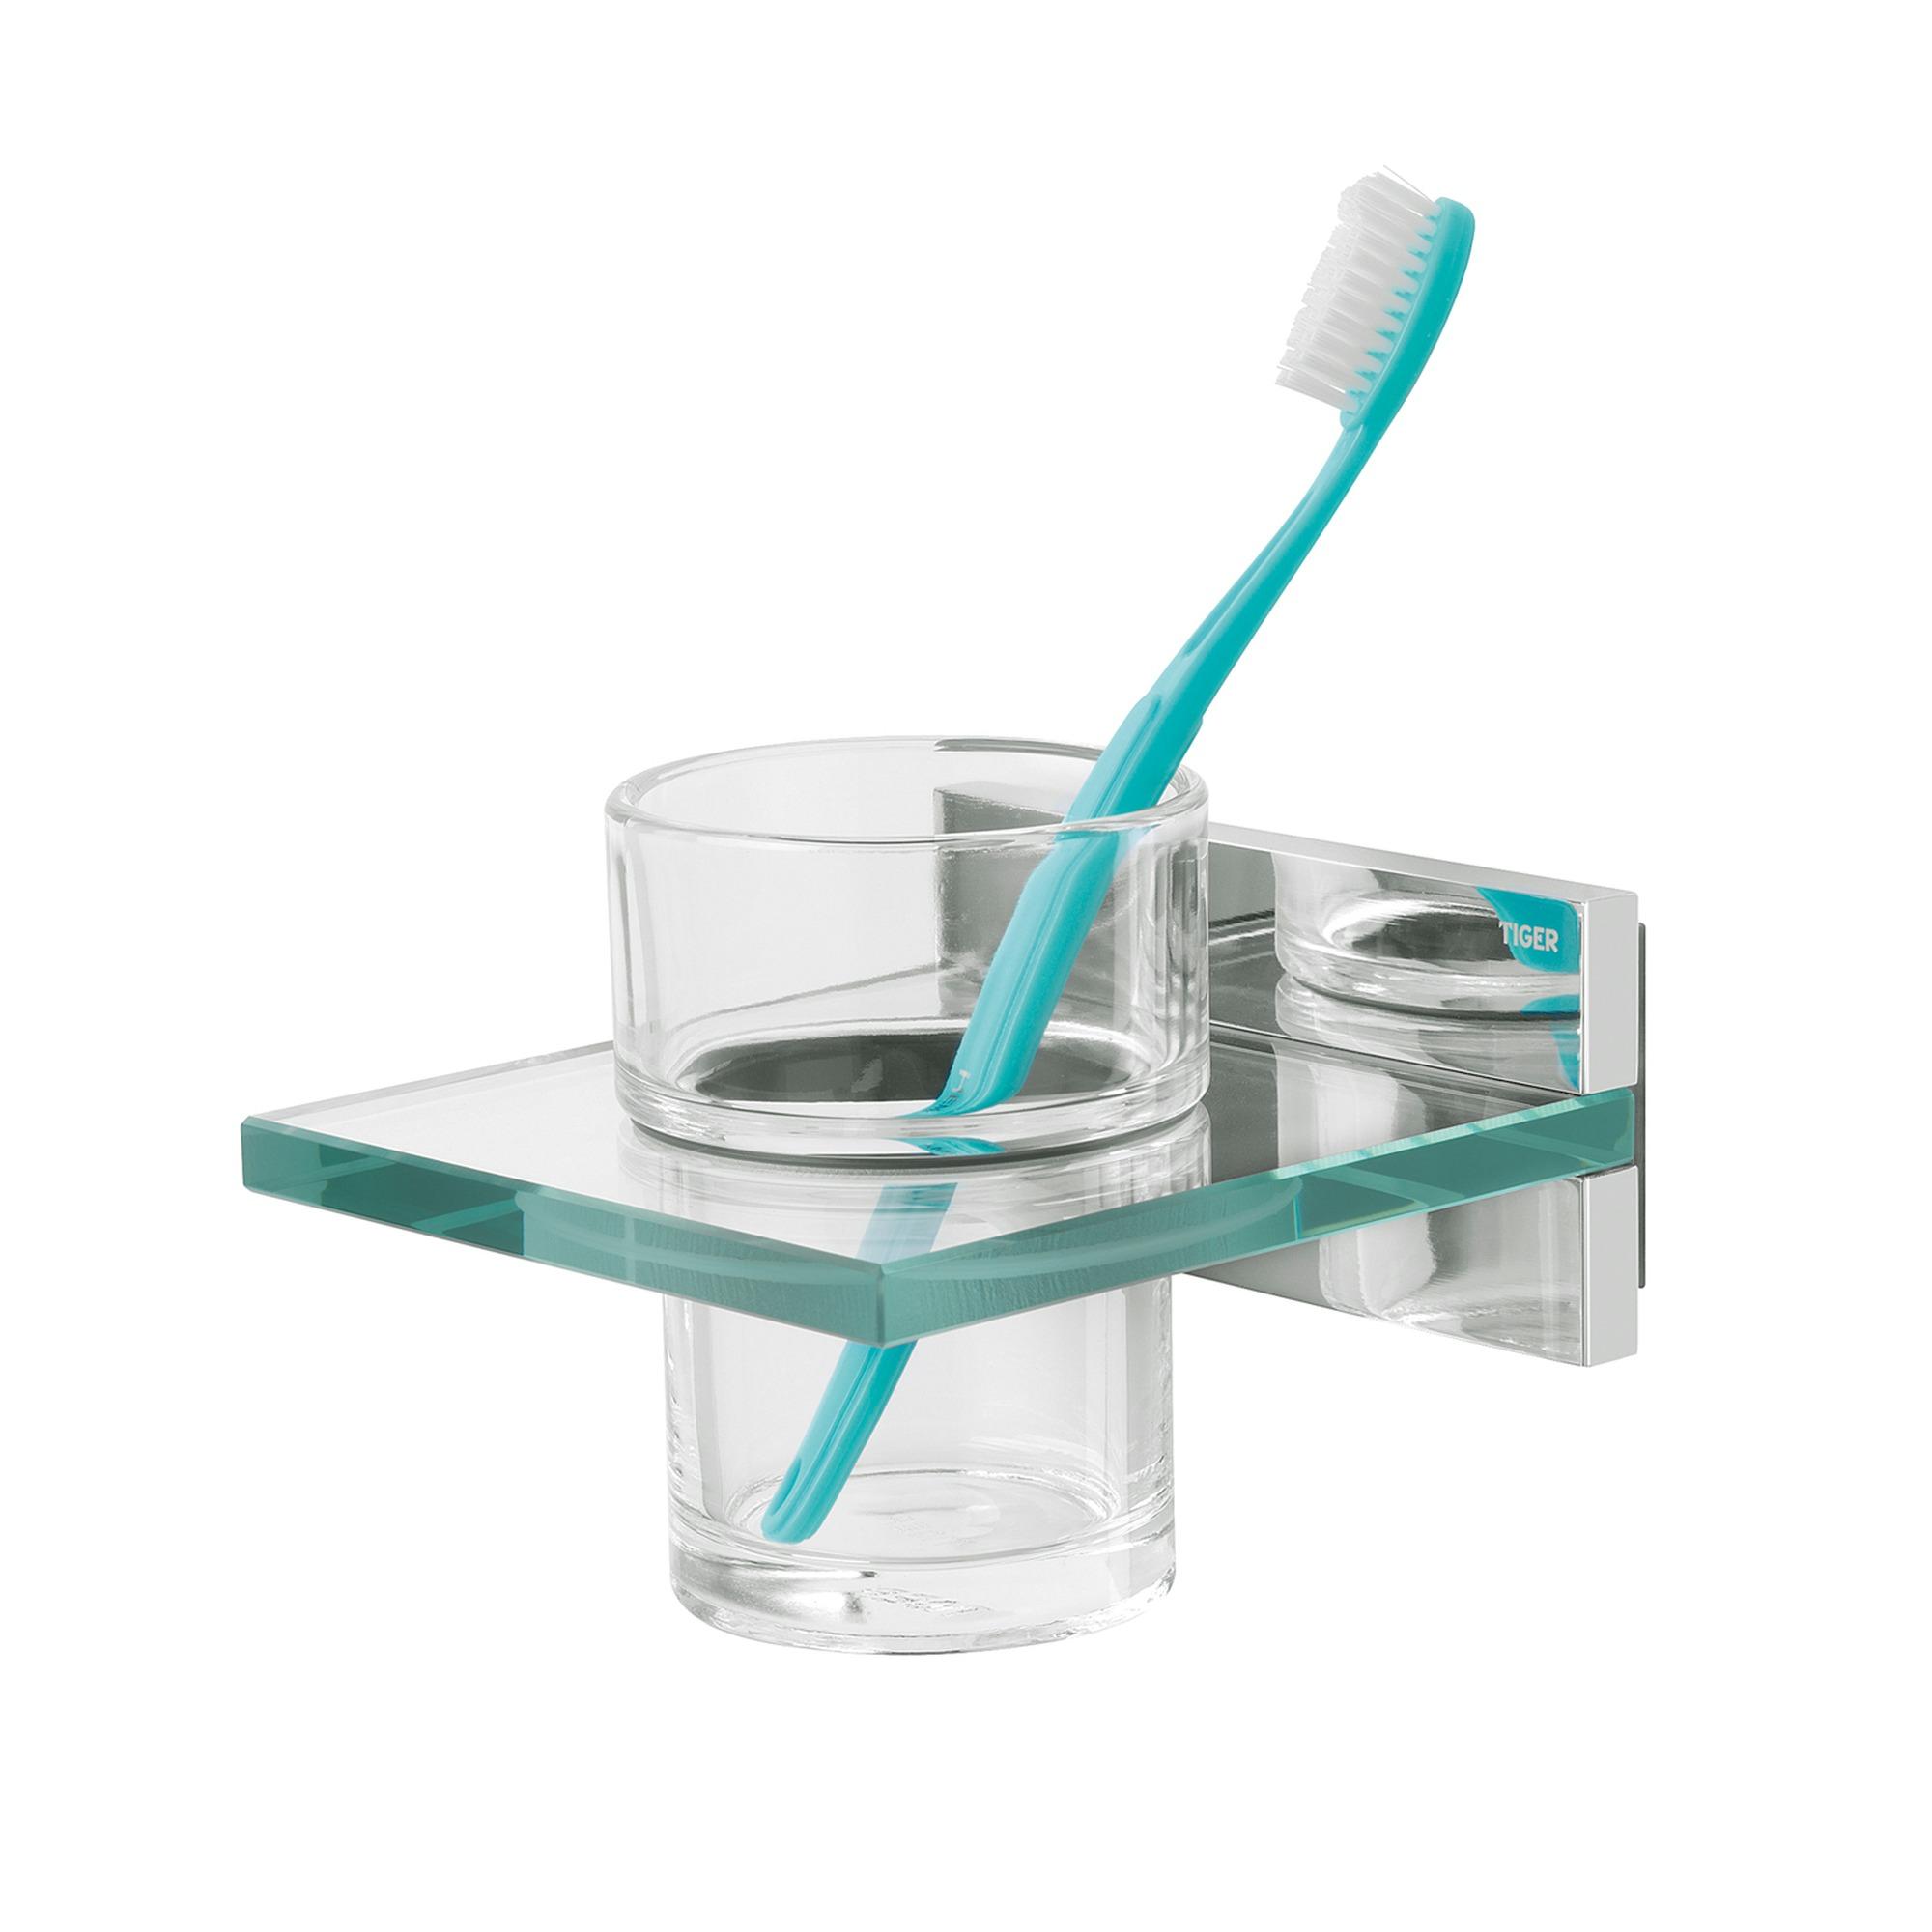 Tiger Safira bekerhouder, chroom-glas